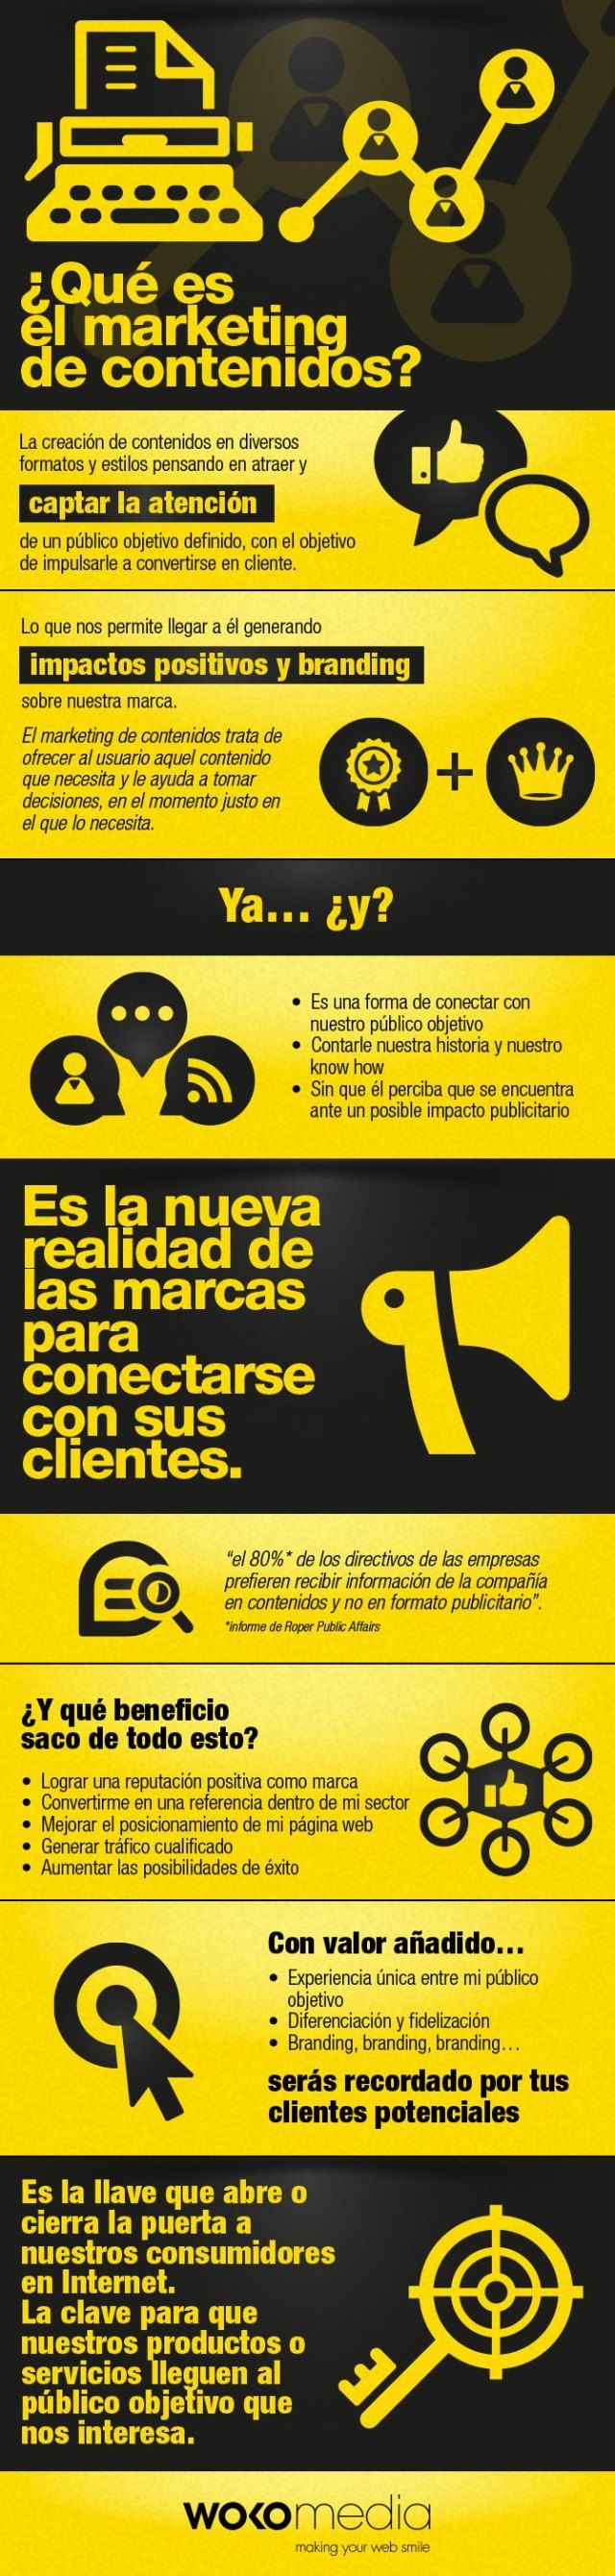 Qué es marketing de contenidos #infografia #infographic #marketing